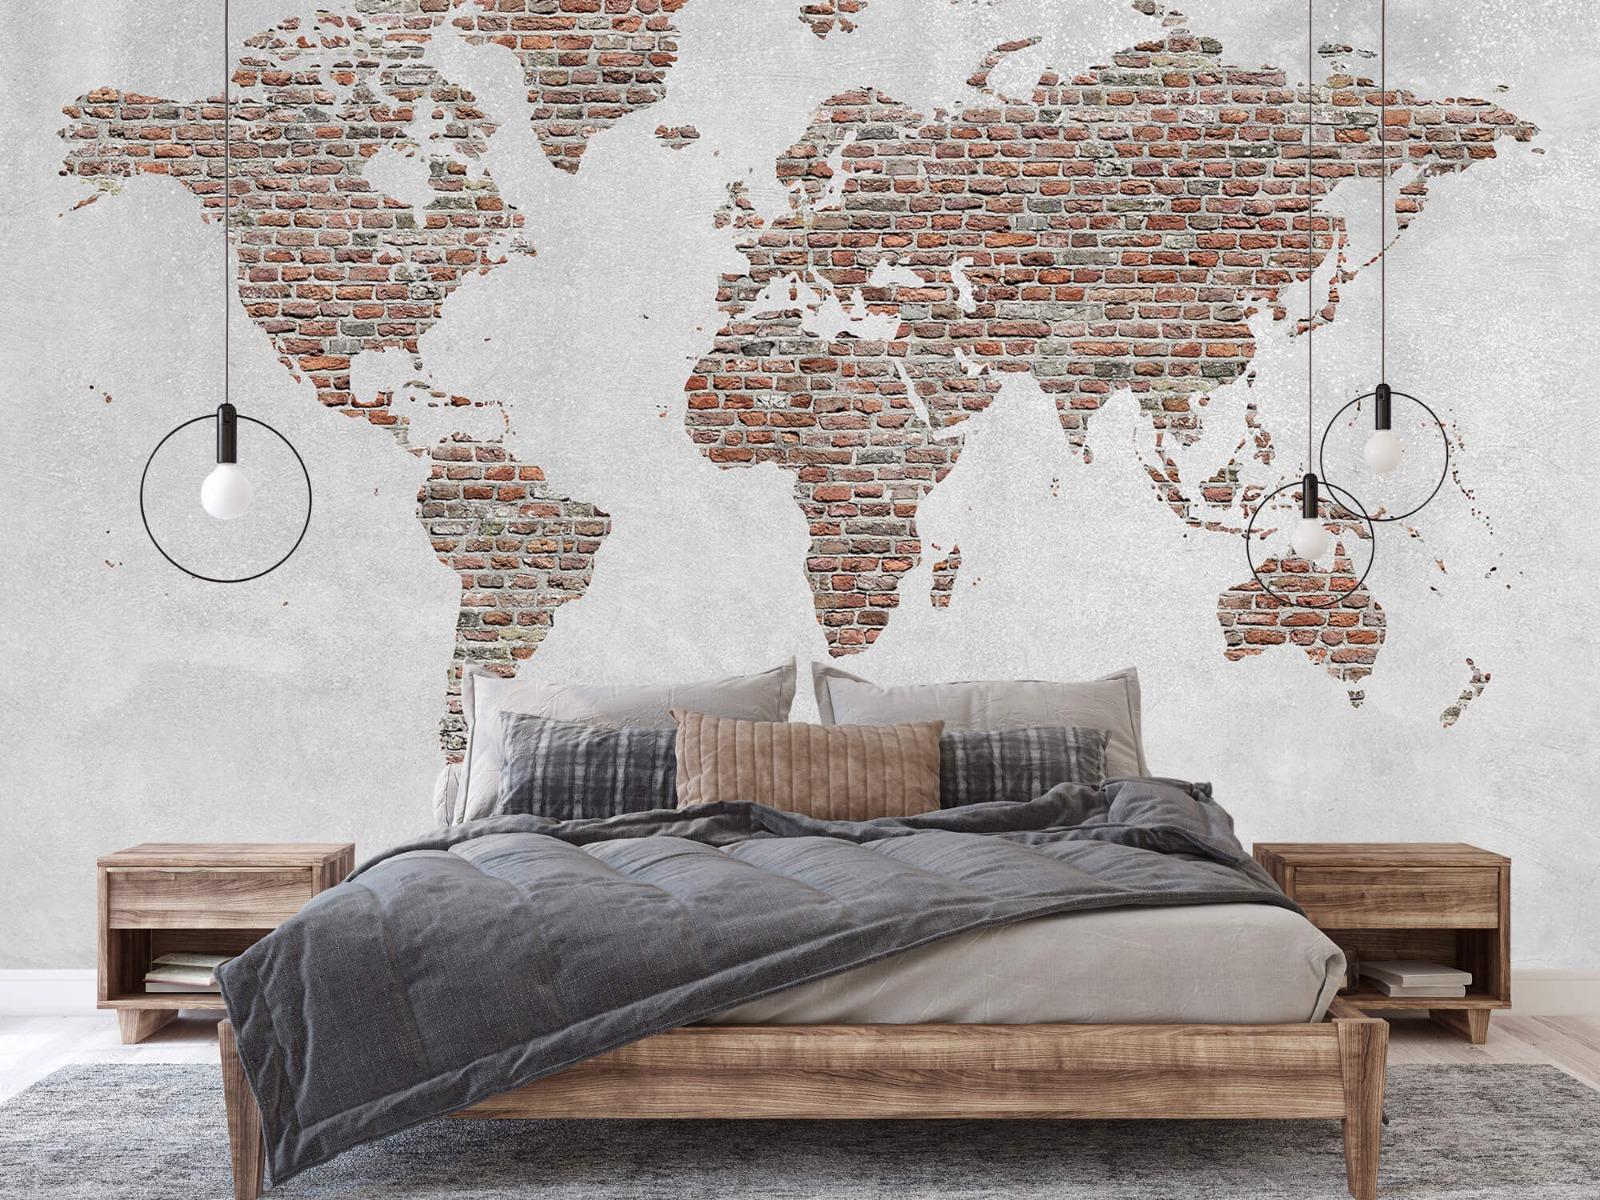 Steen behang - Wereldkaart stenen - Slaapkamer 1